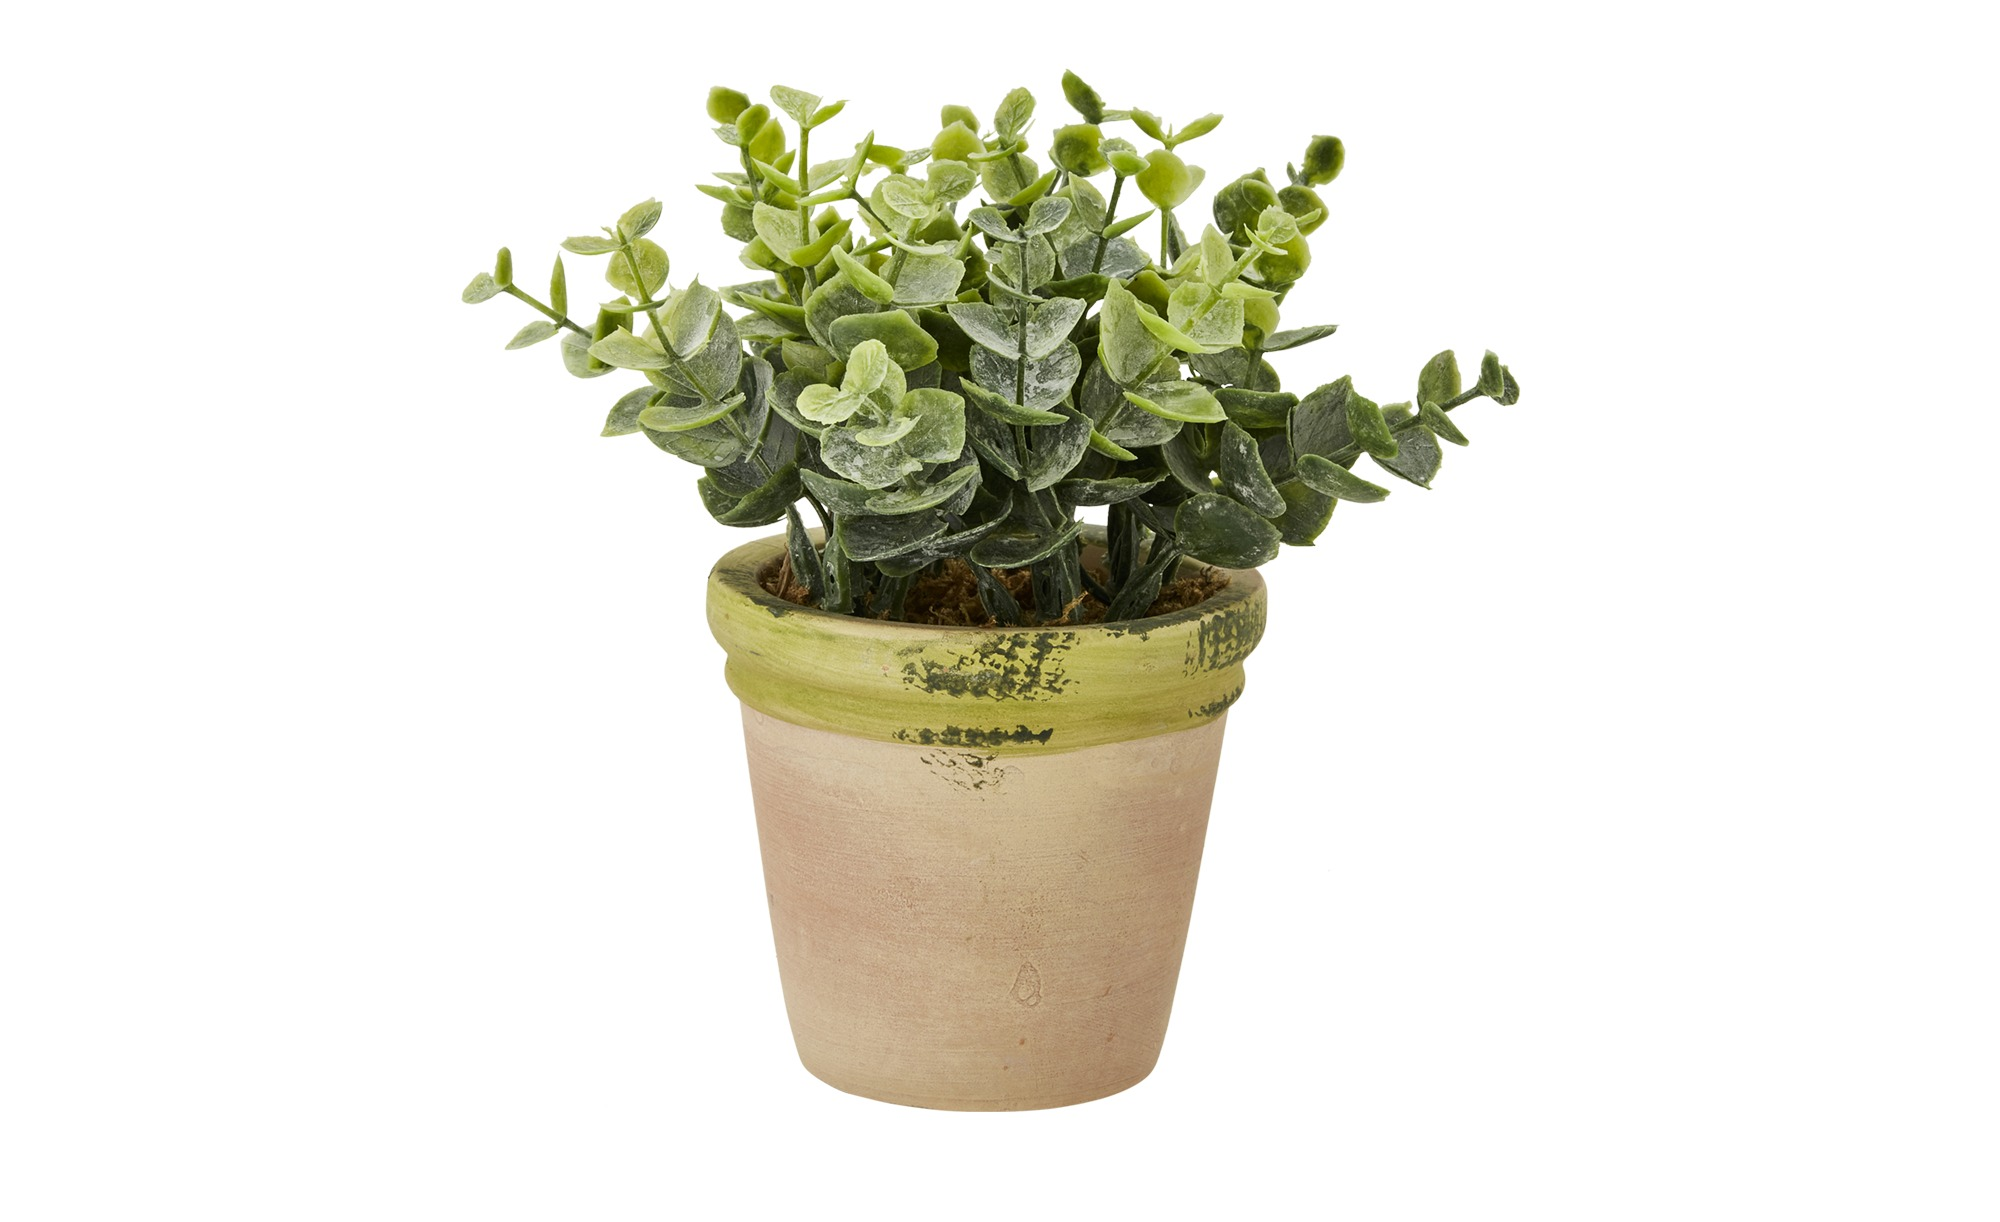 Kunstblume im Terracotta-Topf - grün - Terracotta, Kunststoff - 16 cm - Dekoration > Kunstblumen - Möbel Kraft   Dekoration > Dekopflanzen > Kunstpflanzen   Terracotta   Sconto